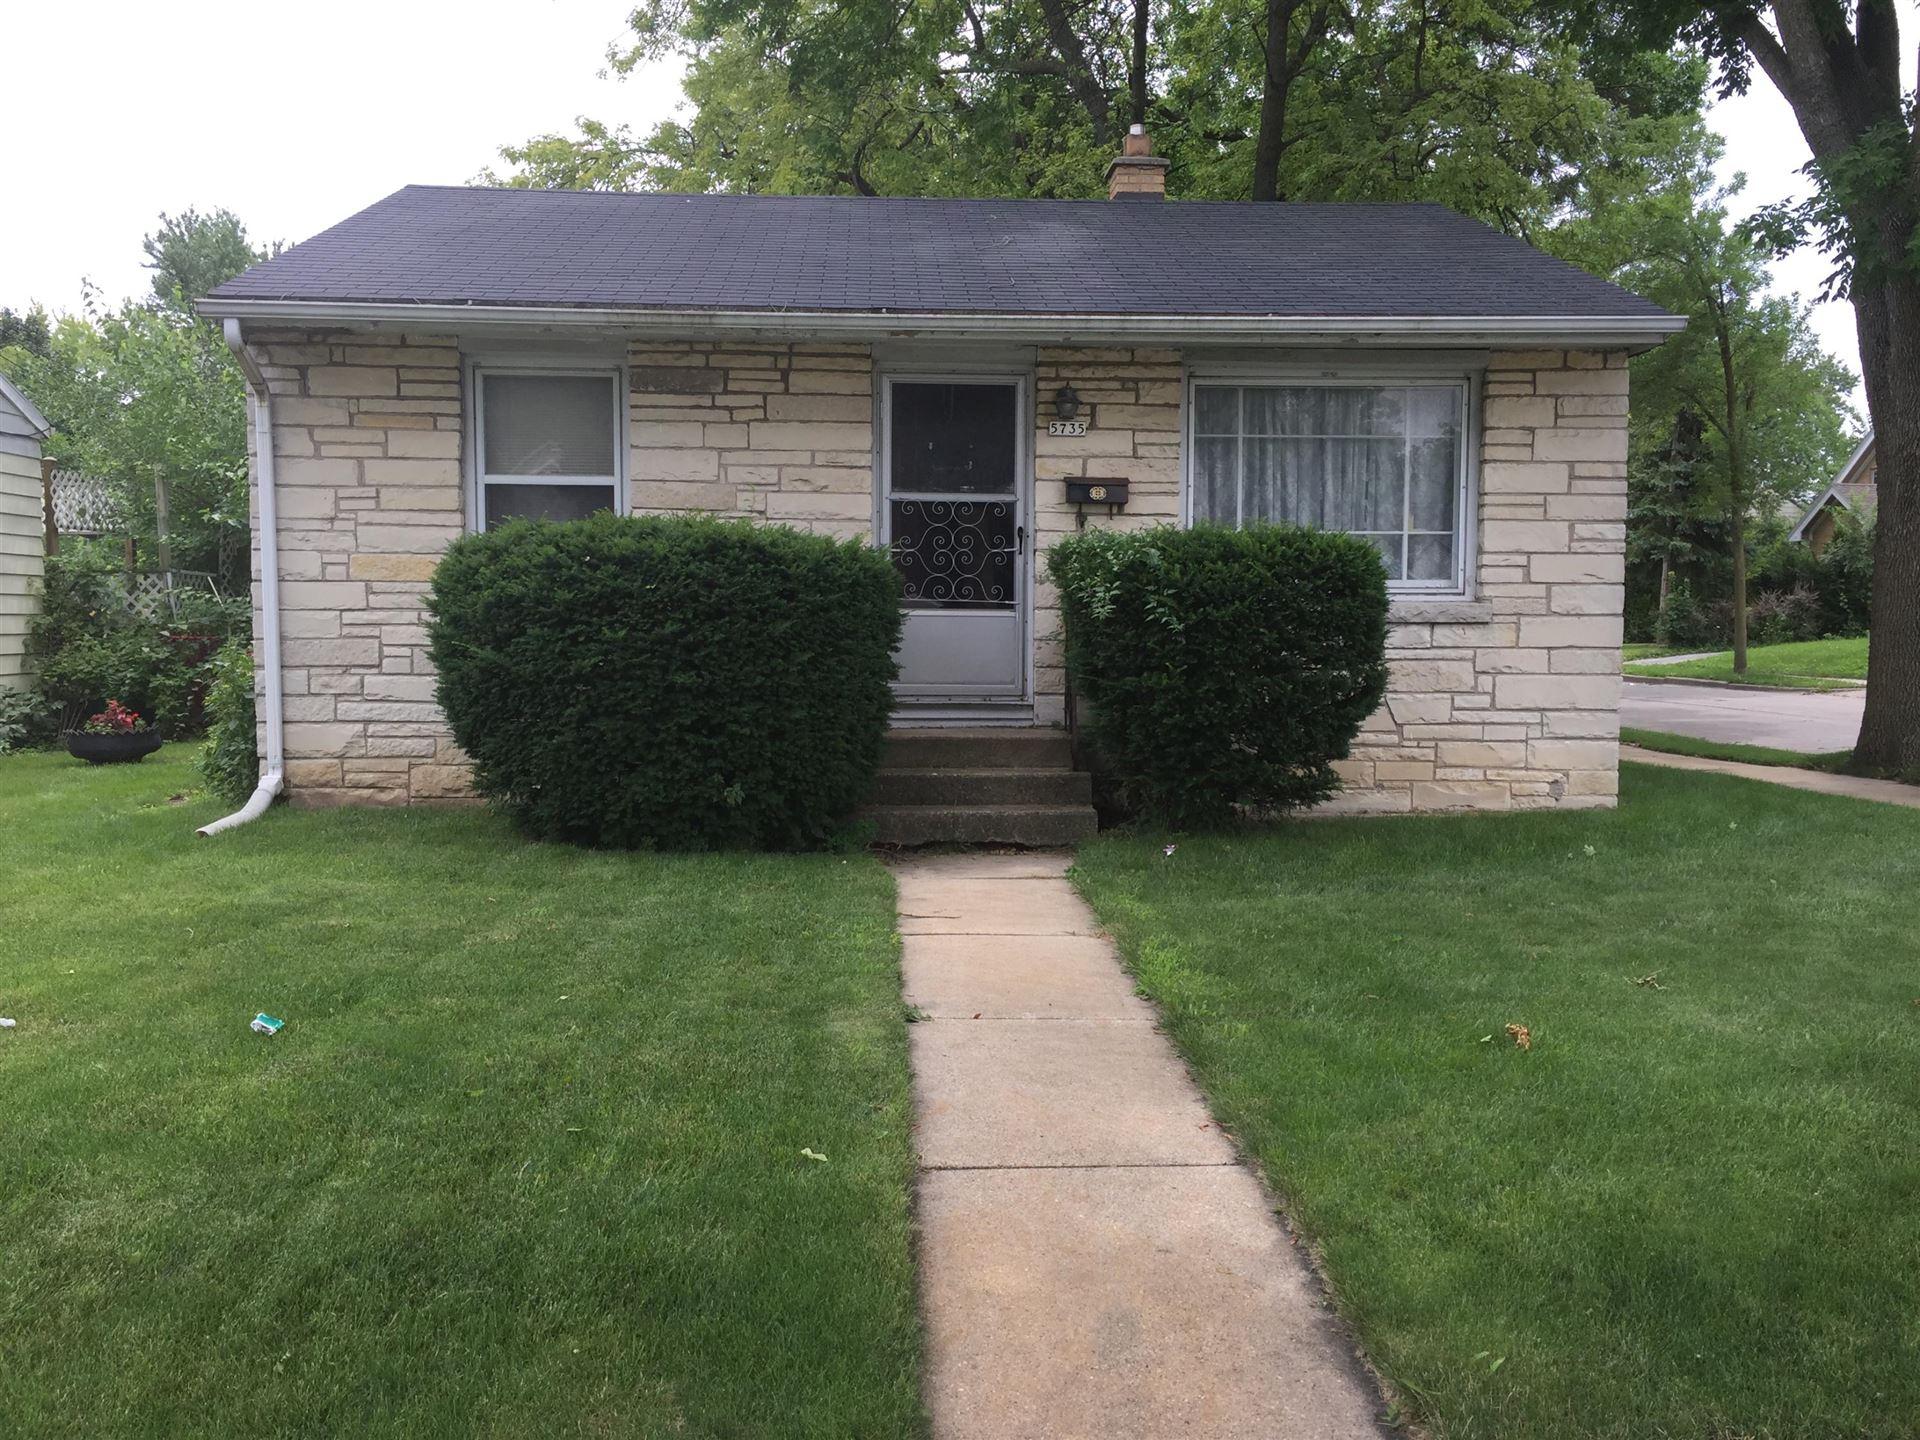 5735 W Villard Ave, Milwaukee, WI 53218 - #: 1701058